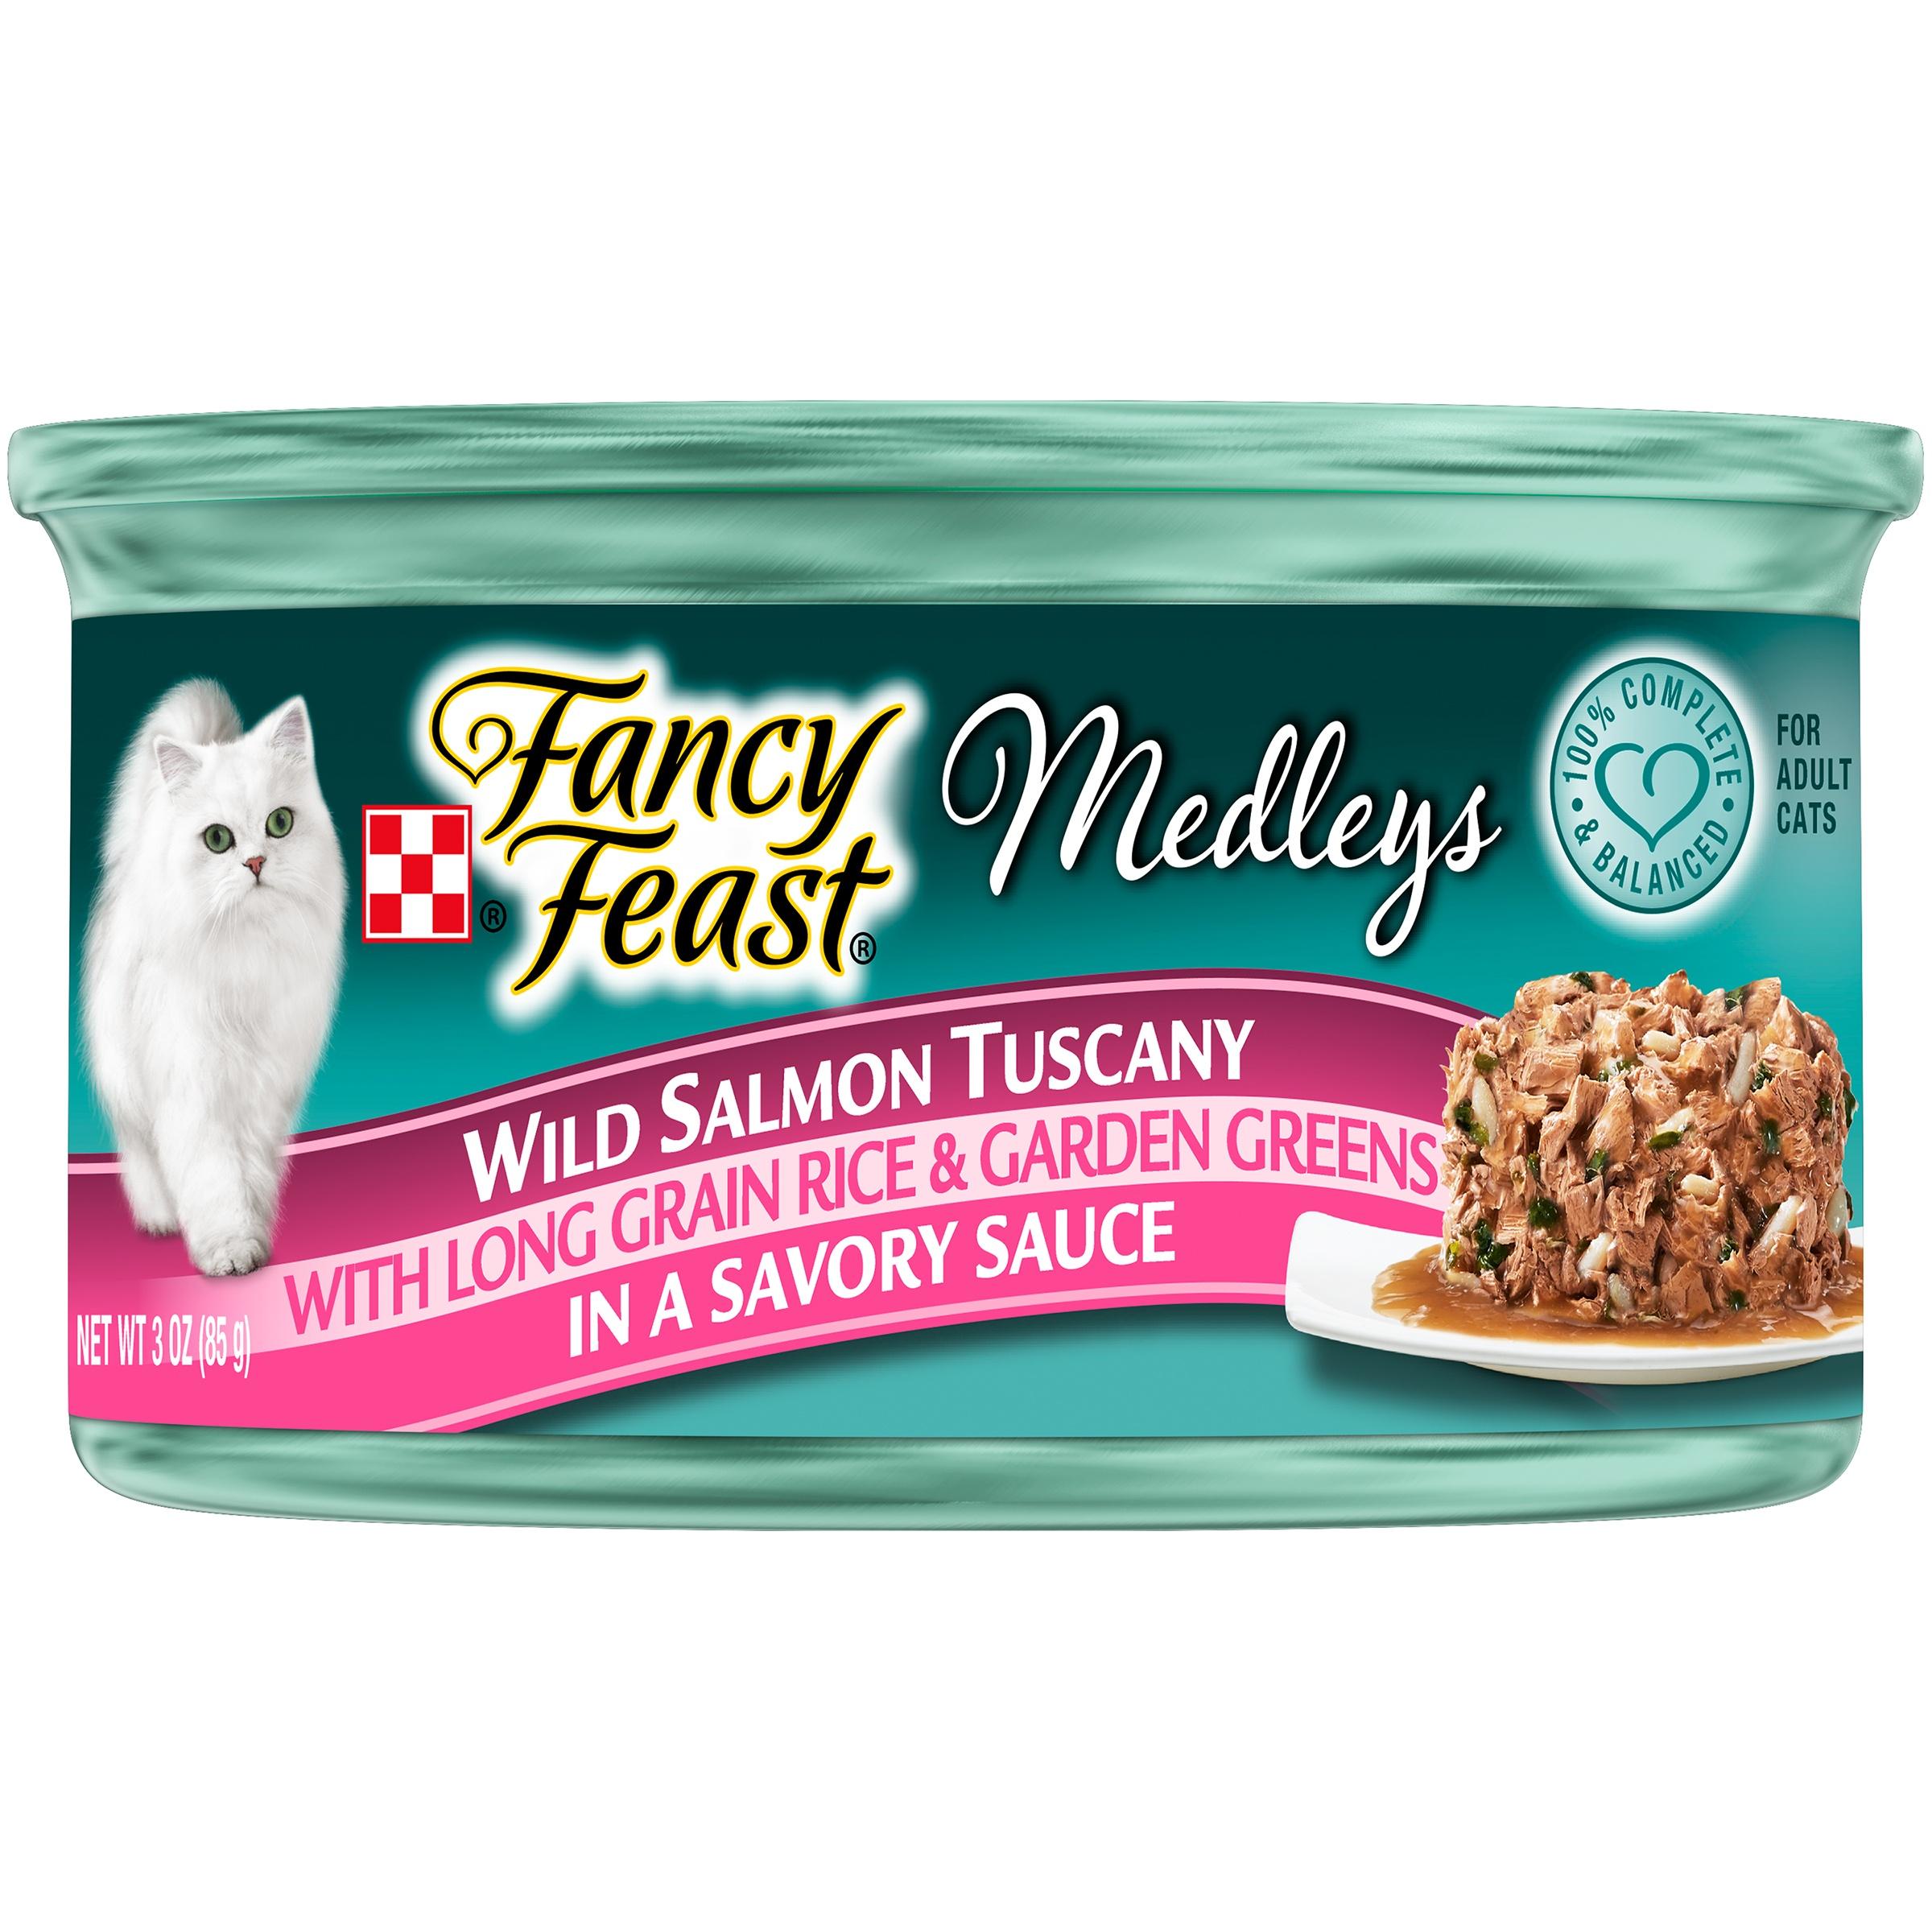 Purina Fancy Feast Medleys Wild Salmon Tuscany Cat Food 3 oz. Can